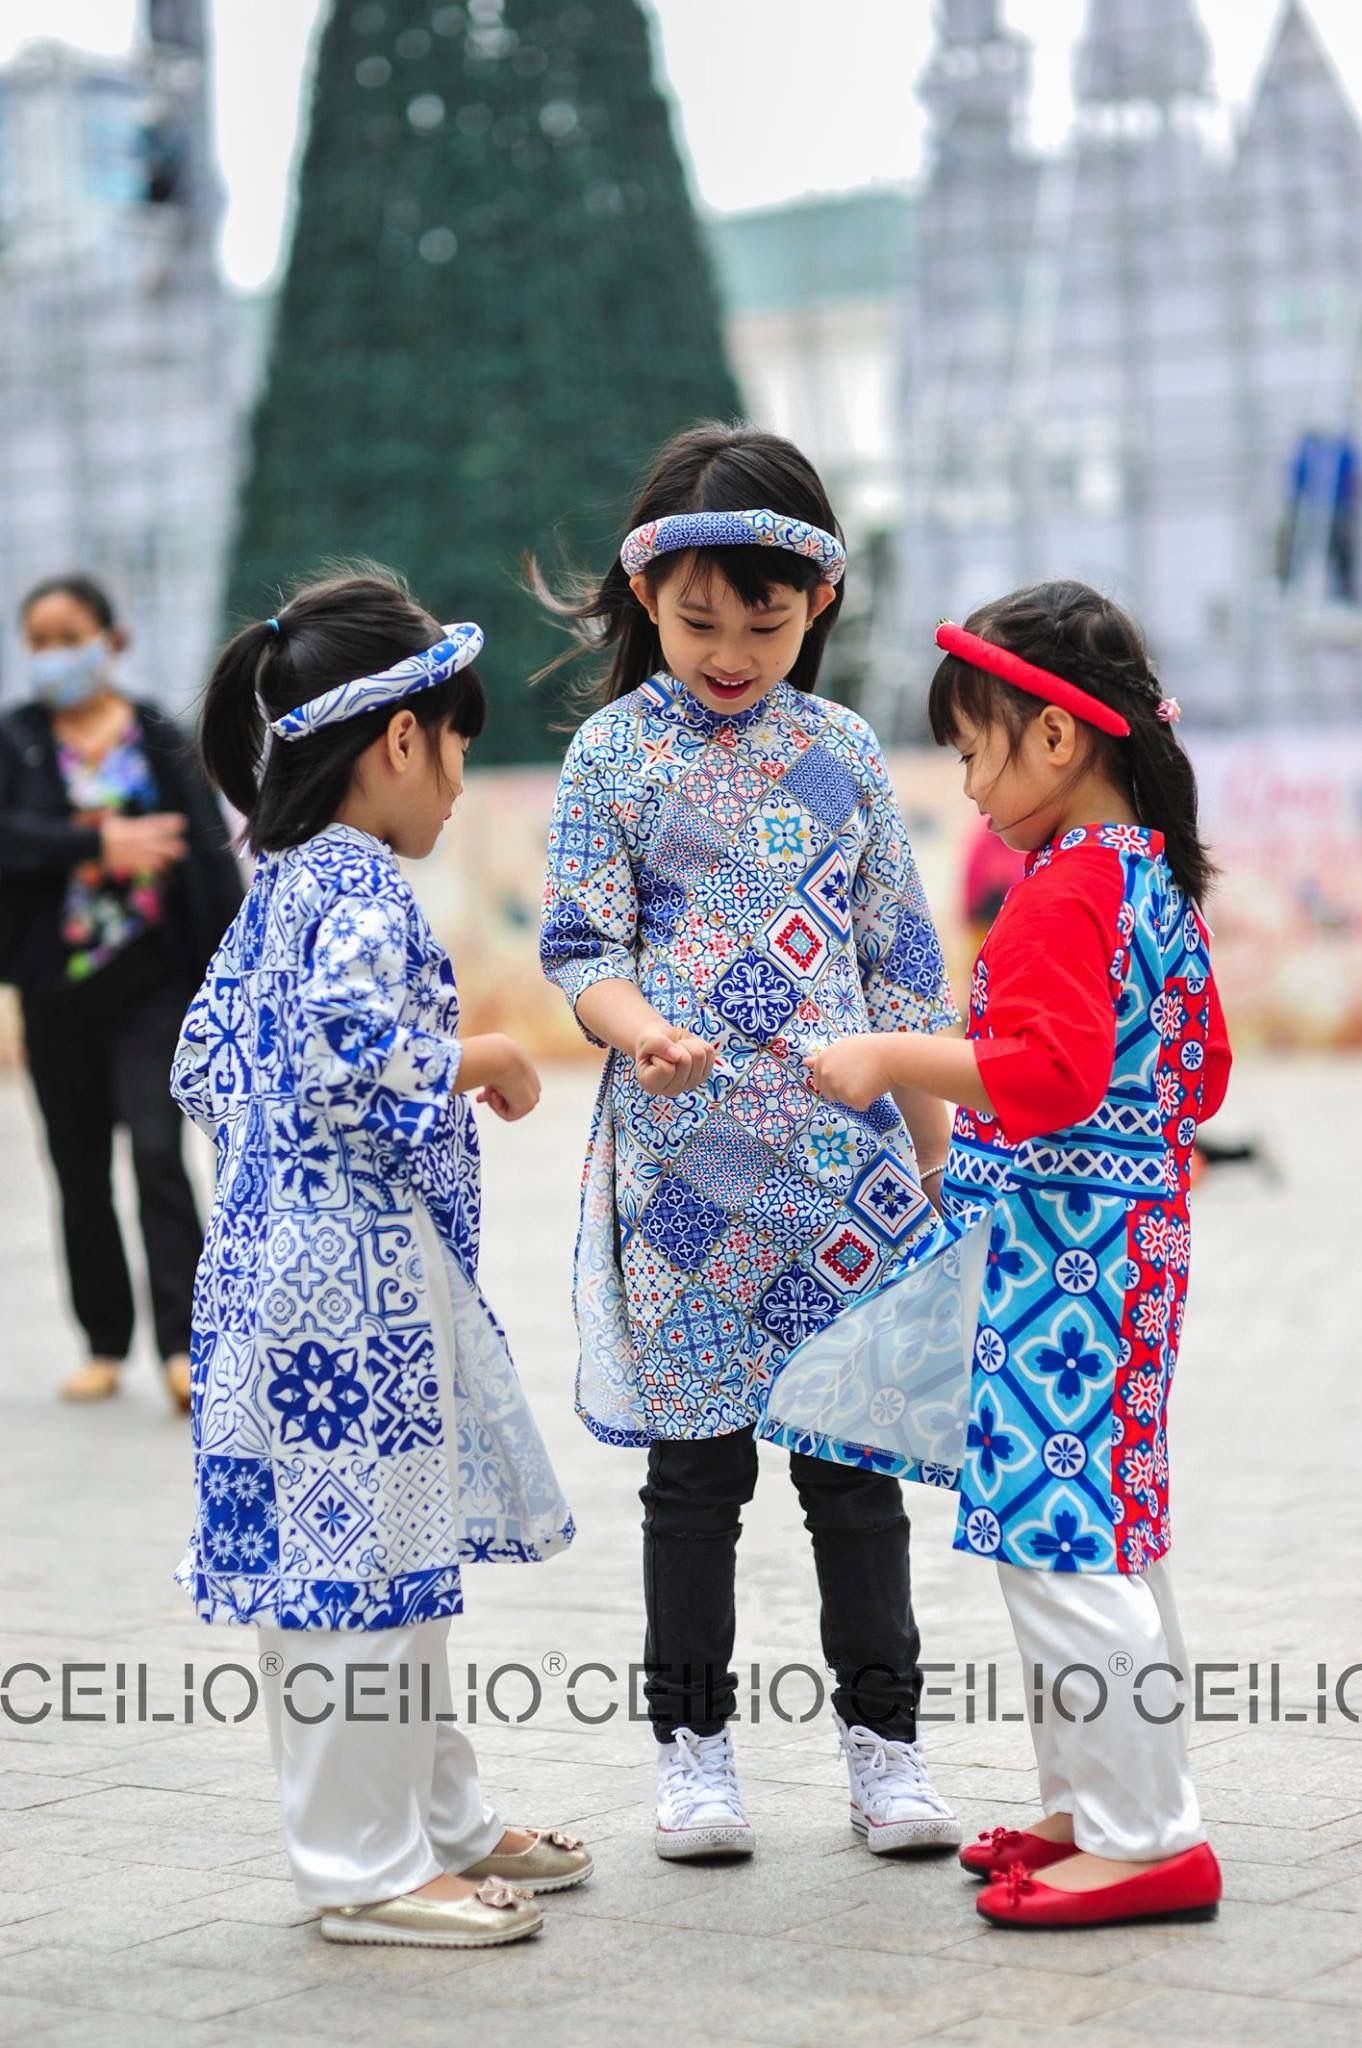 Ghim của duong yen trên ao dai/Vietnamese dress Áo dài